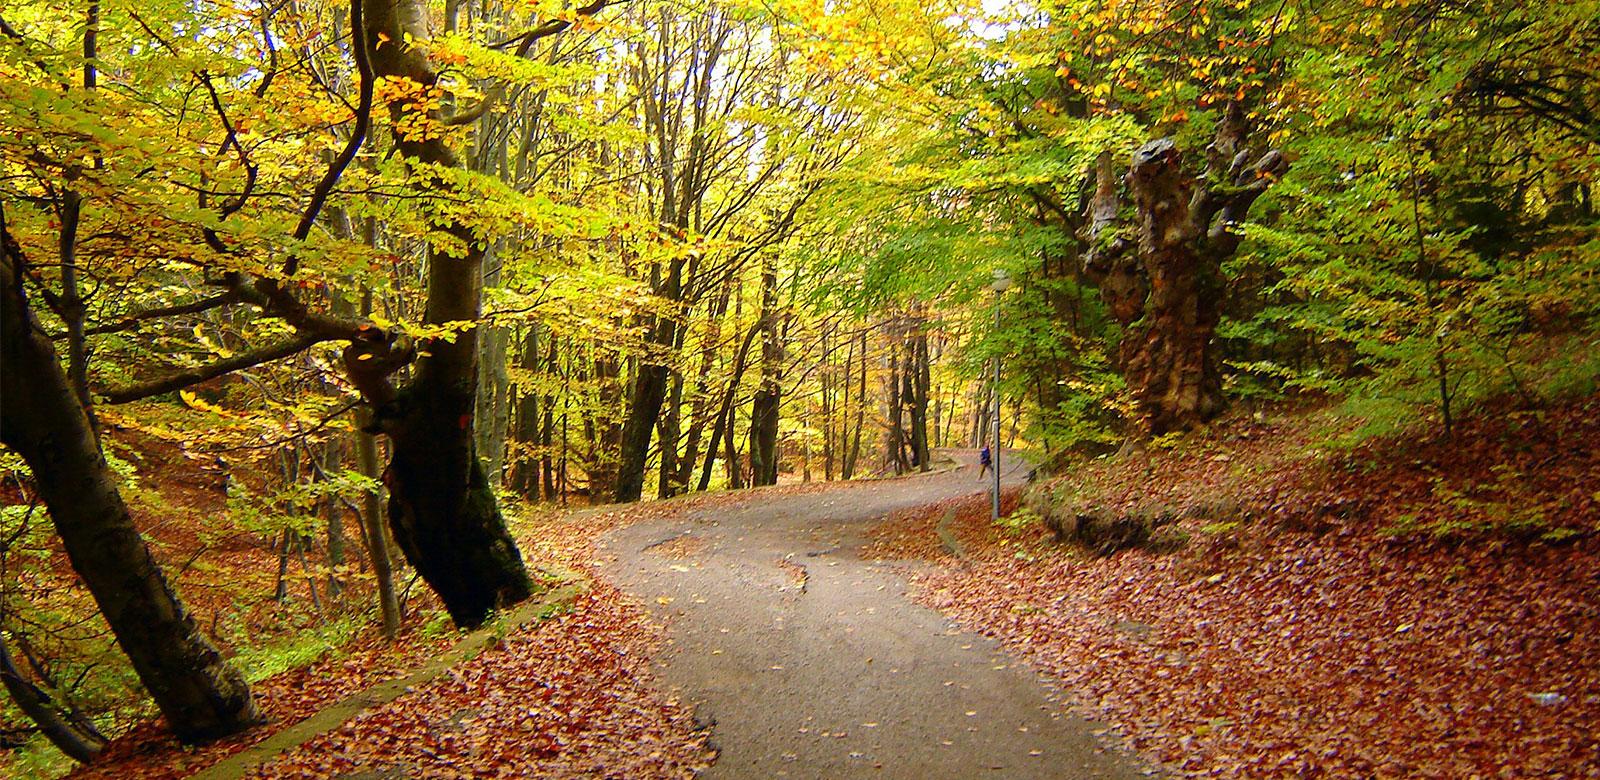 bg-automne